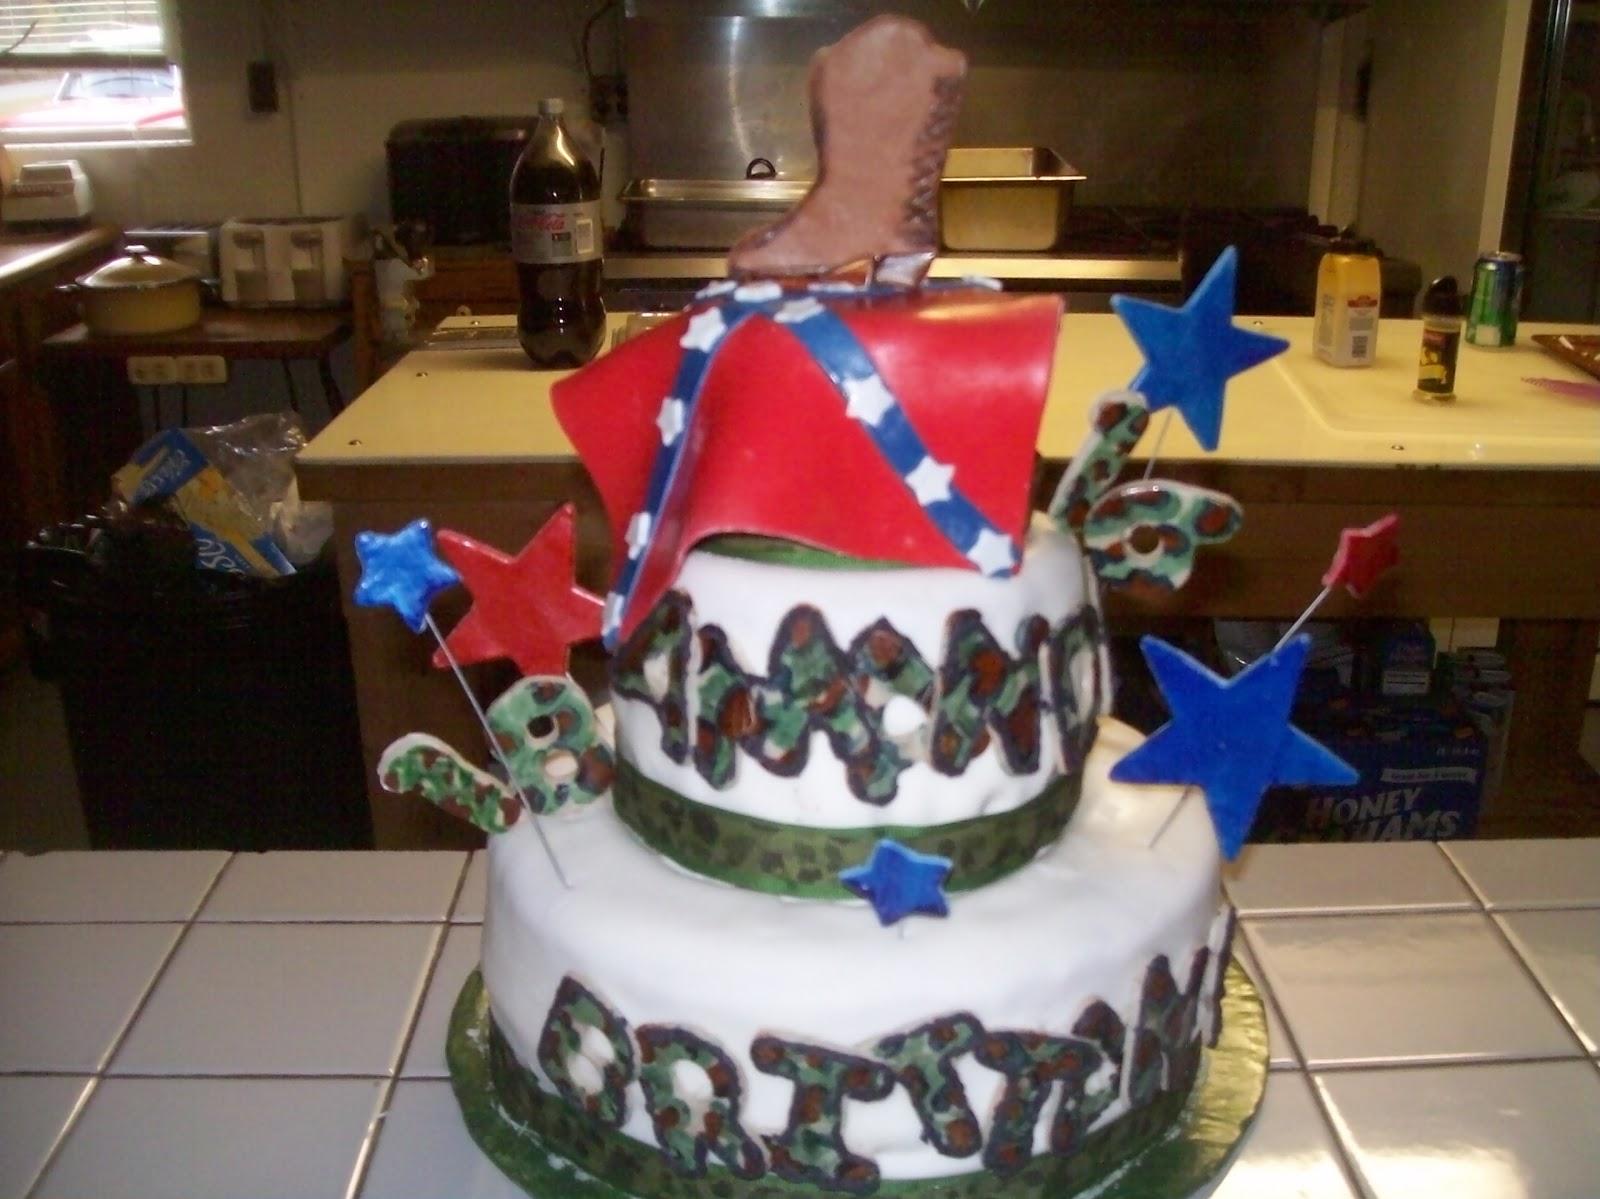 Marvelous 10 Redneck Birthday Cakes Pictures Photo Redneck Birthday Cake Funny Birthday Cards Online Alyptdamsfinfo